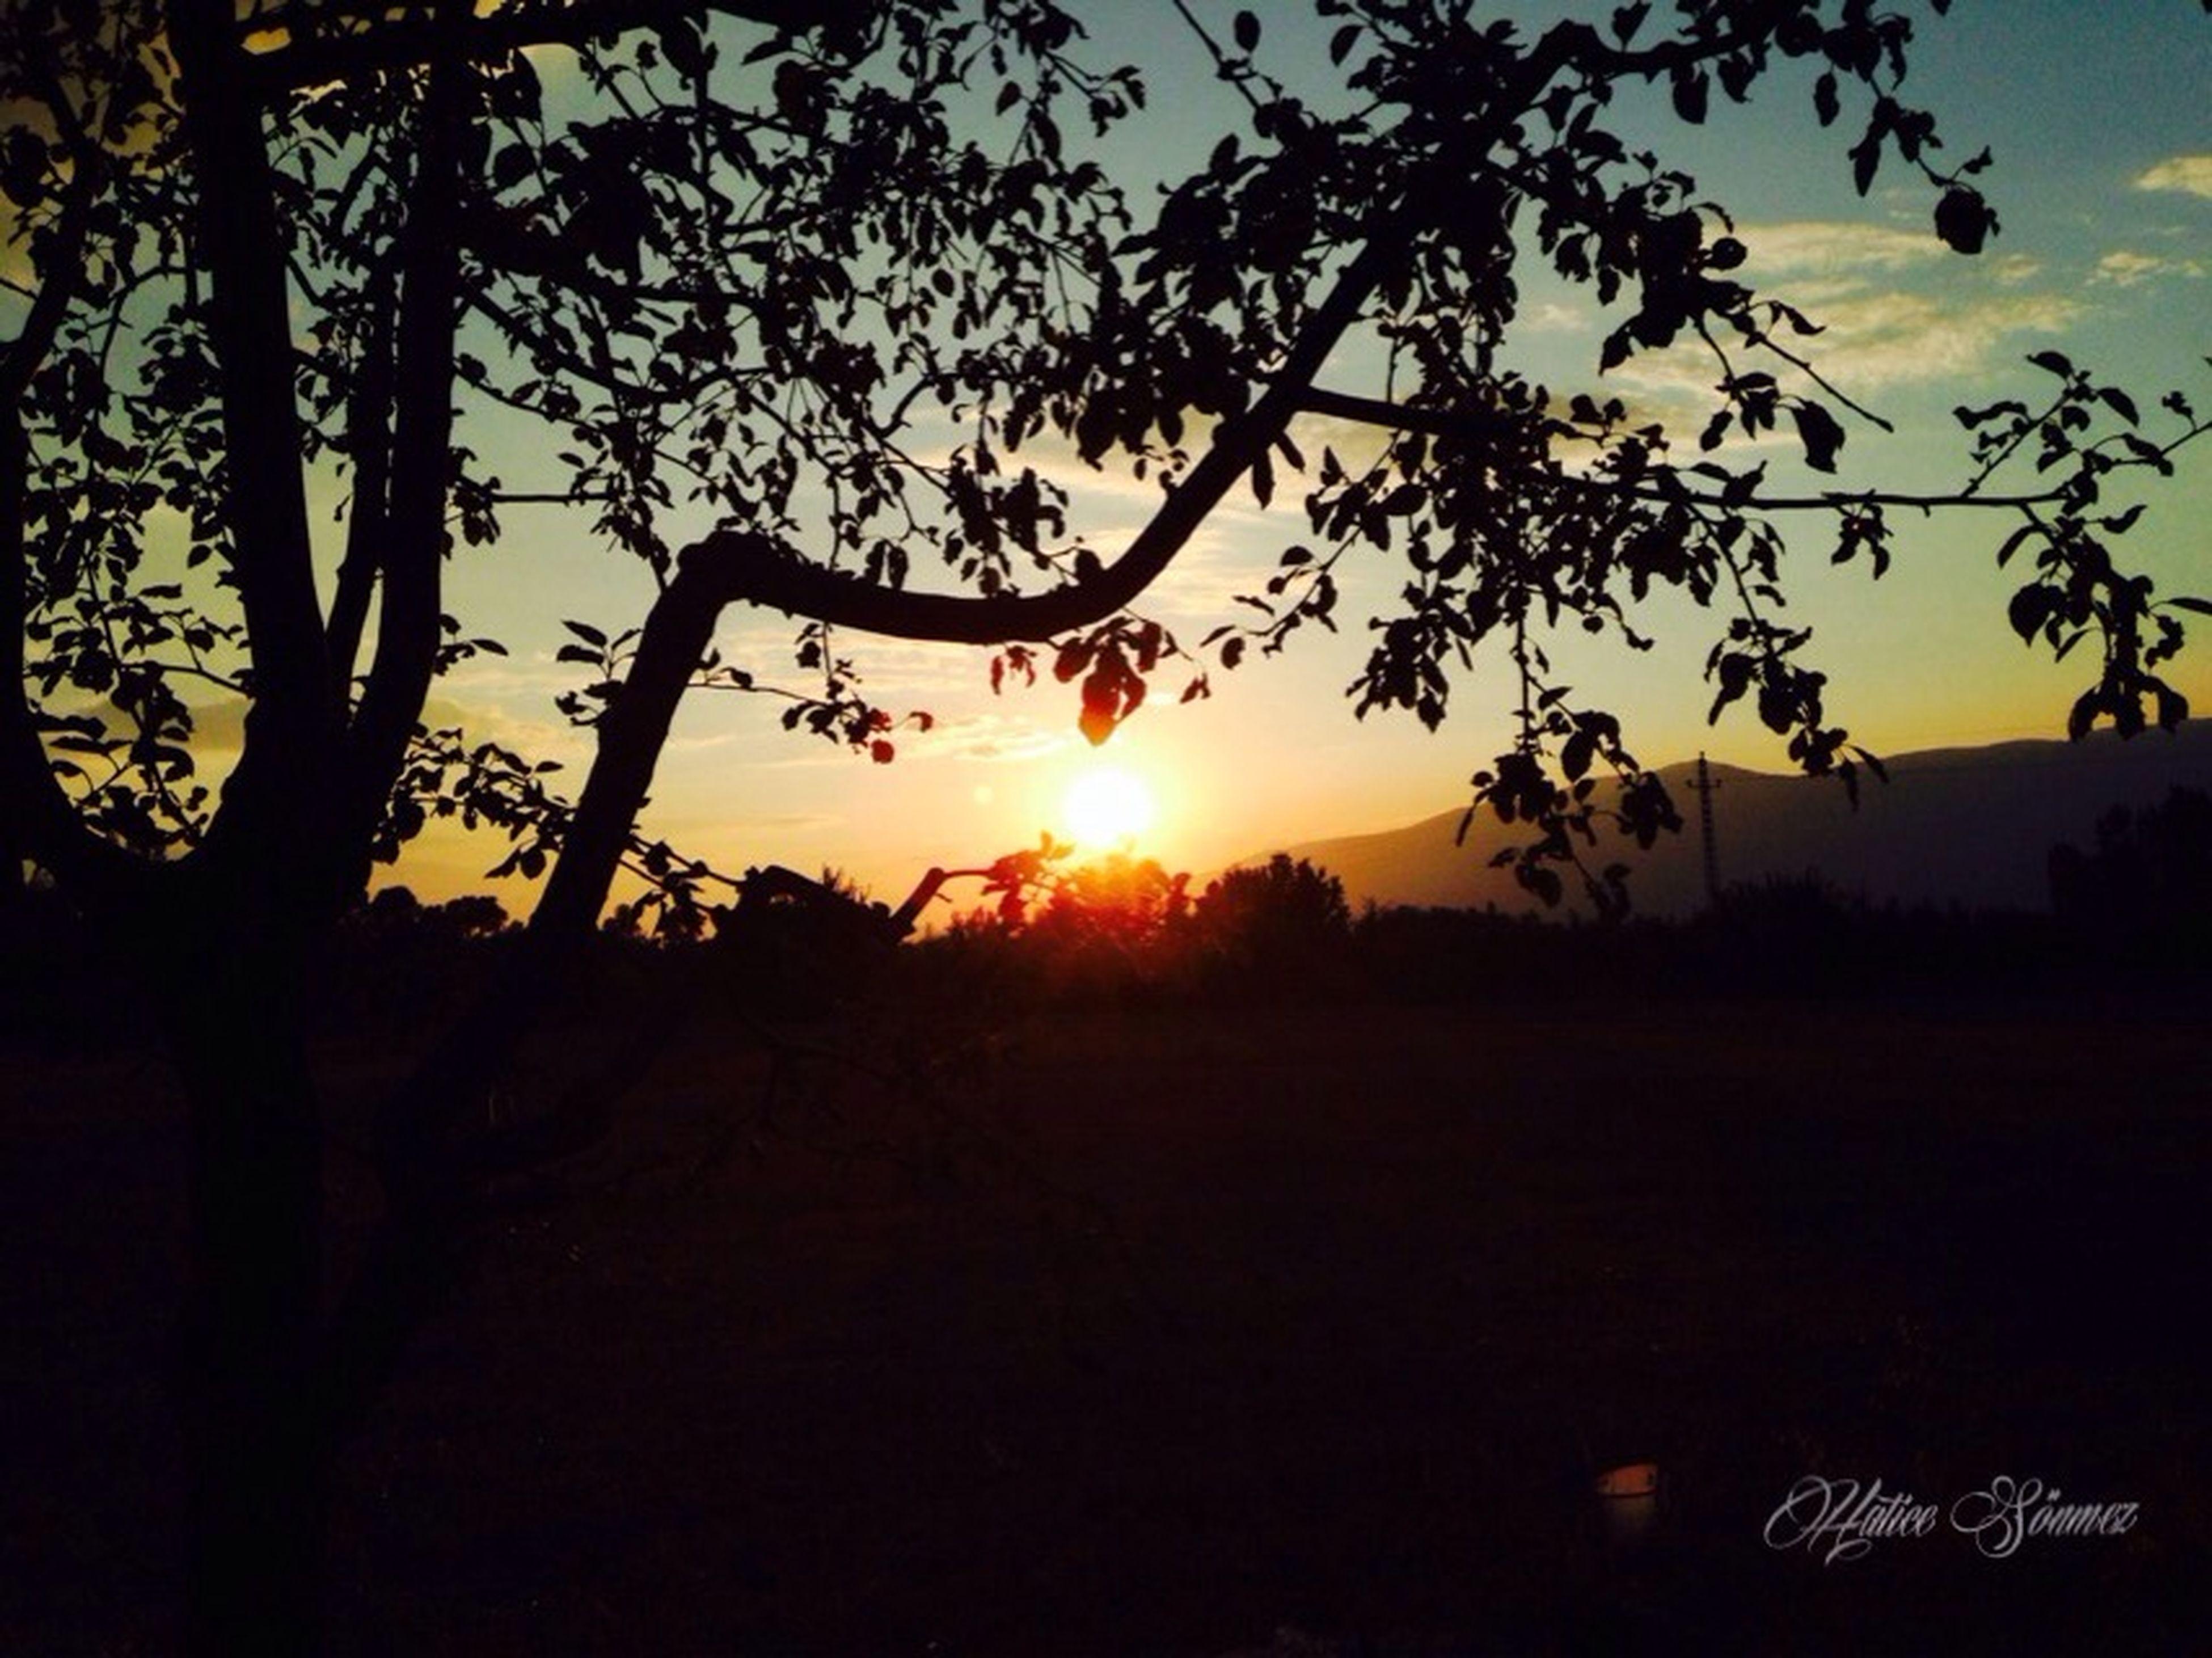 sunset, sun, silhouette, scenics, tranquil scene, tranquility, beauty in nature, landscape, orange color, sky, tree, sunlight, nature, sunbeam, idyllic, lens flare, back lit, field, branch, outdoors